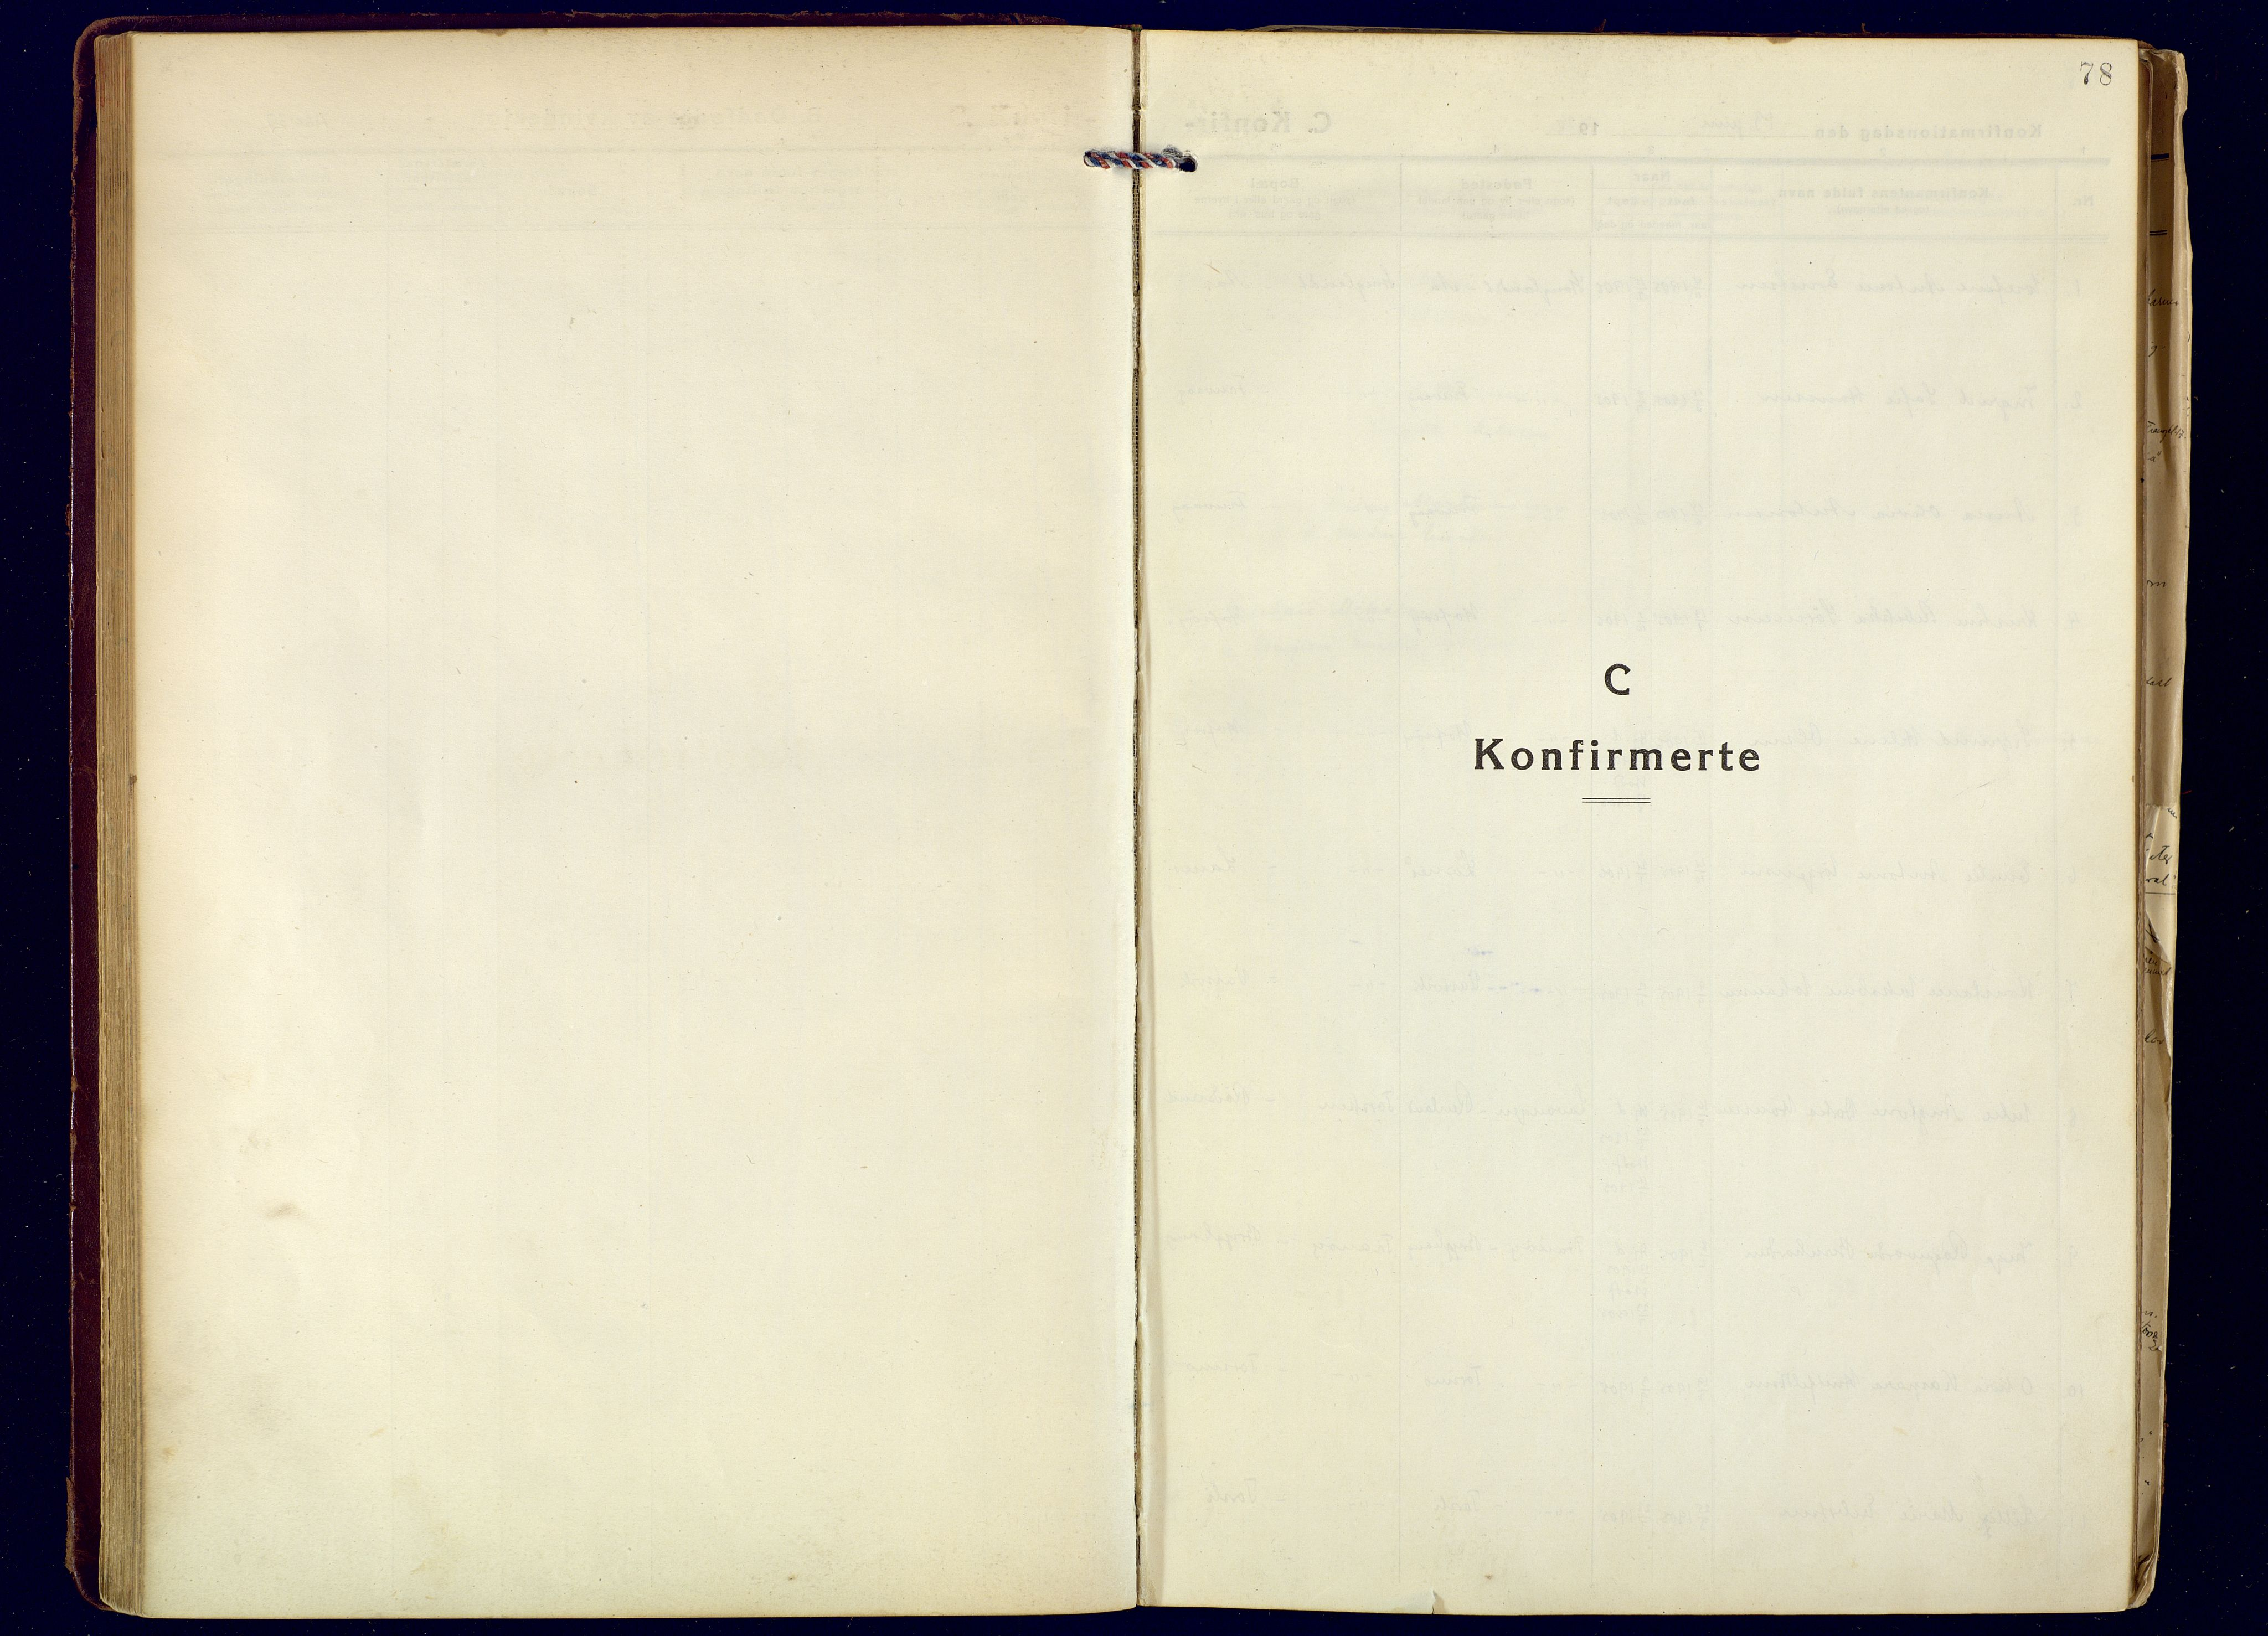 SATØ, Tranøy sokneprestkontor, I/Ia/Iaa: Ministerialbok nr. 16, 1919-1932, s. 78